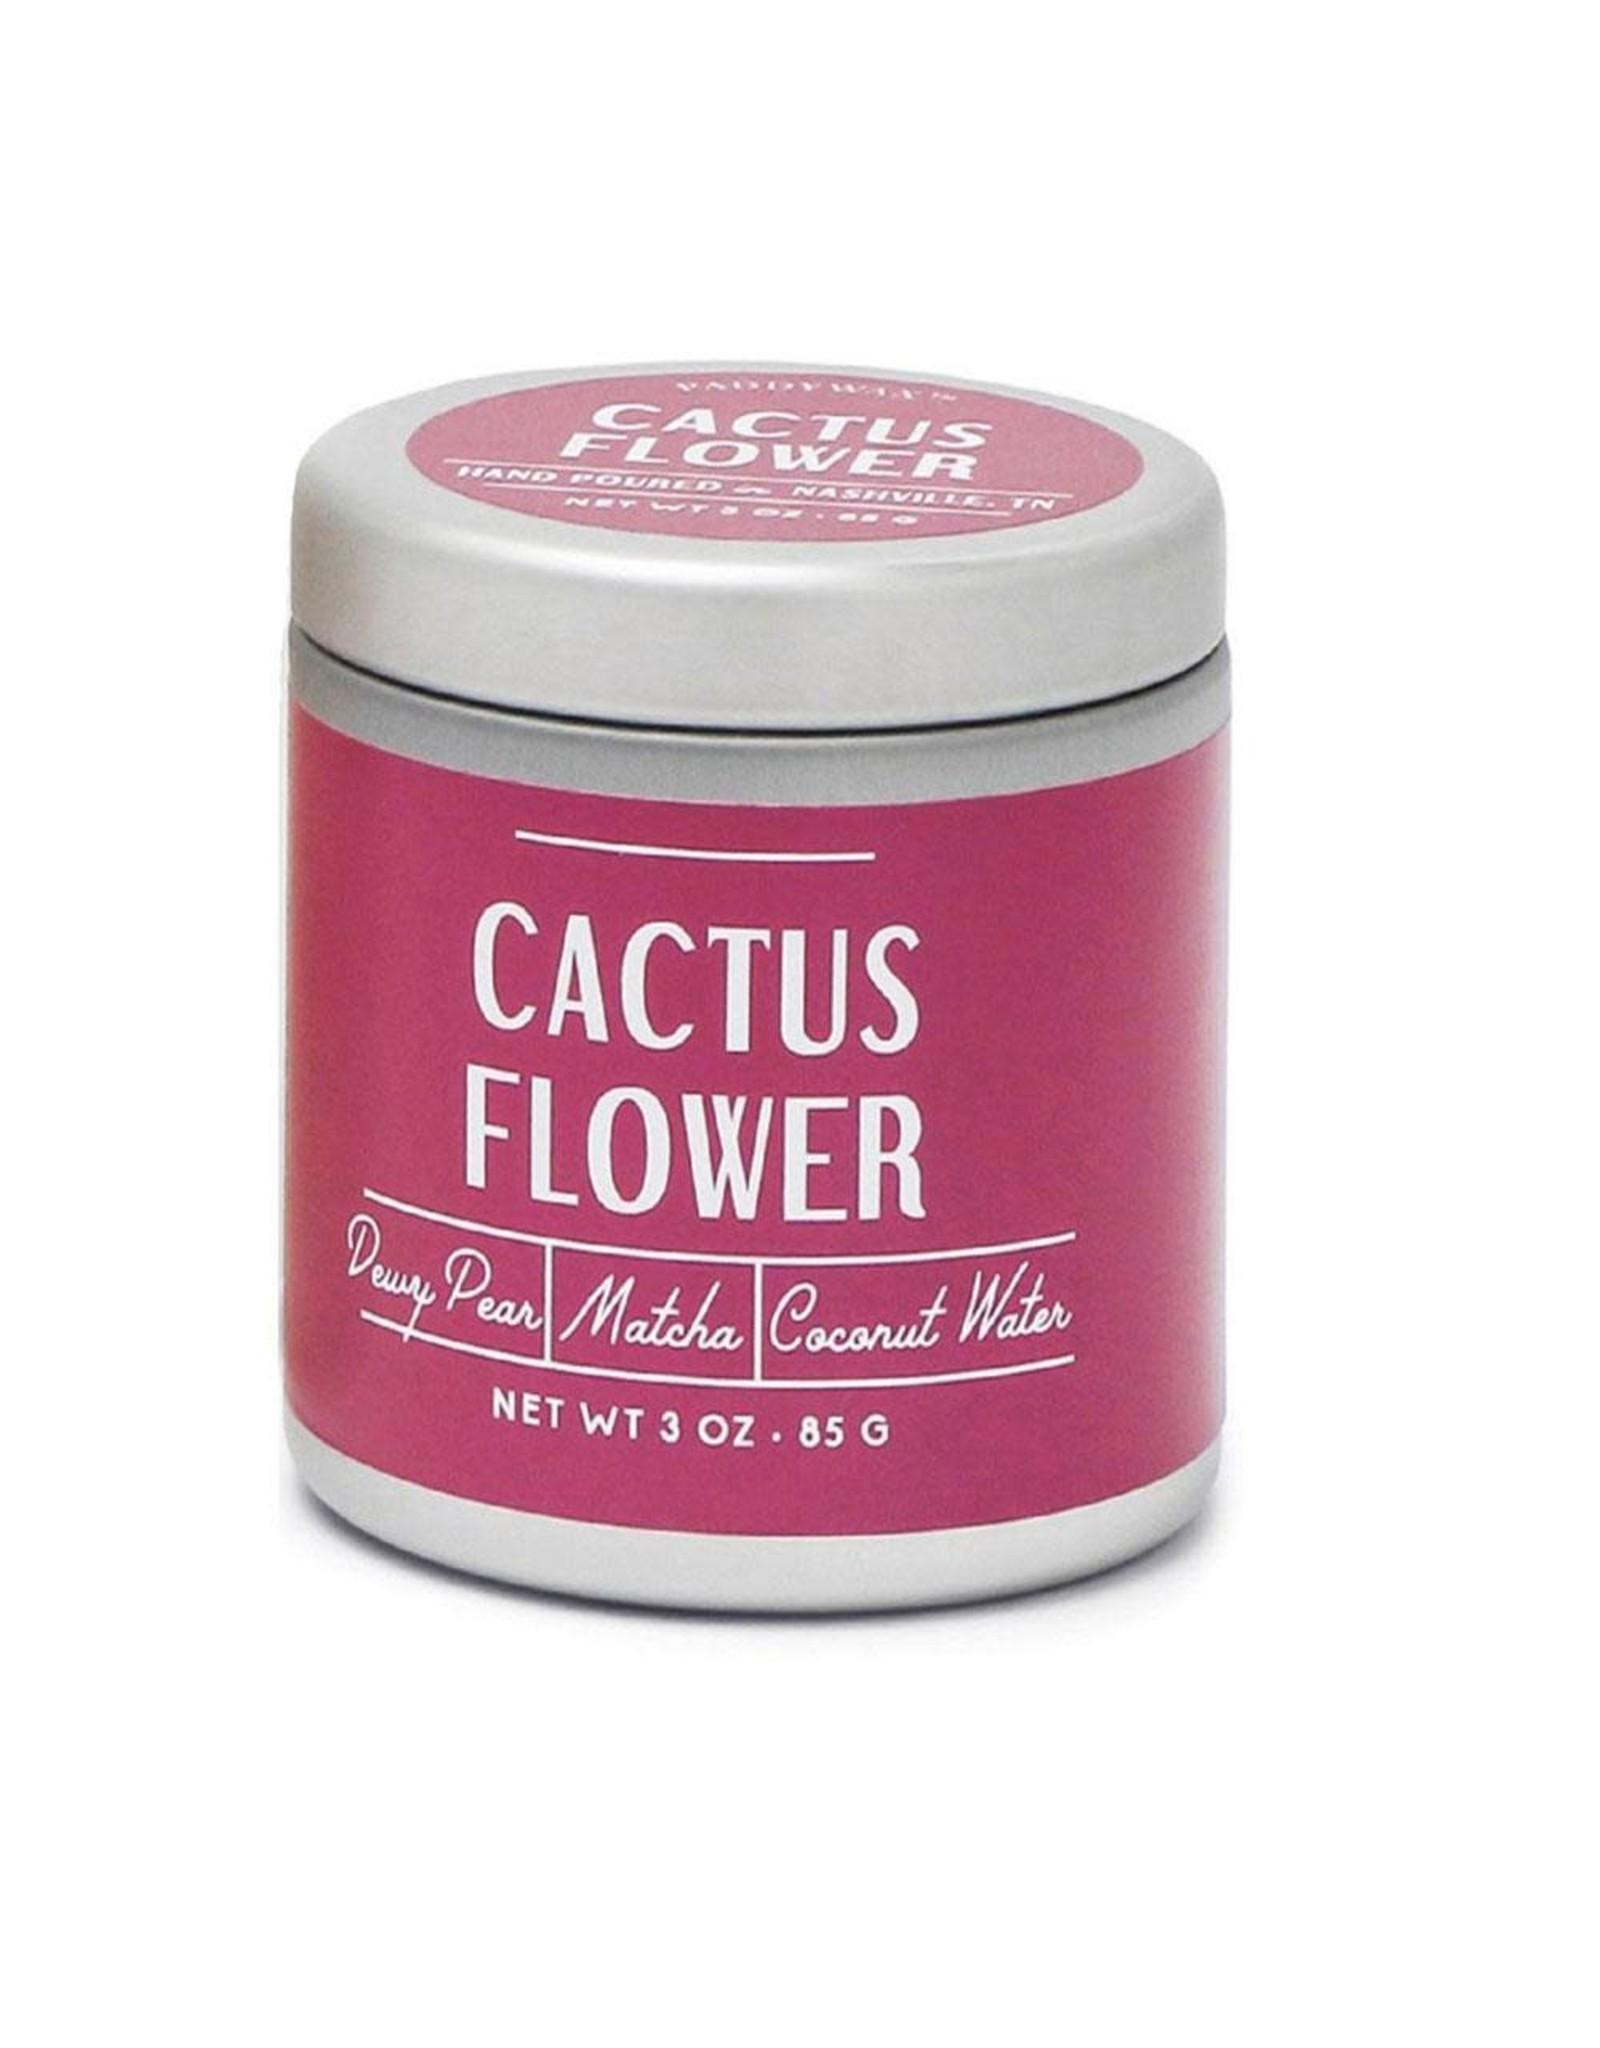 Farmhouse Cactus Flower 3 oz Tin Candle